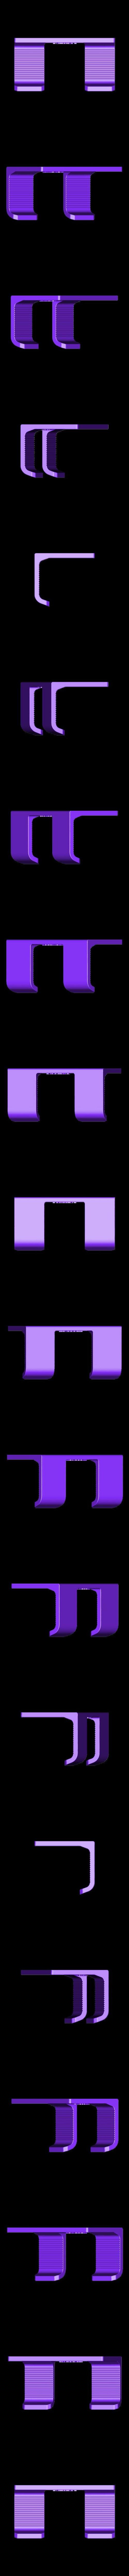 enforce_1350_screws.stl Download free STL file Extra Long Club Hammer 1250Grams/3LB for screws or peg board • 3D printable template, Wiesemann1893